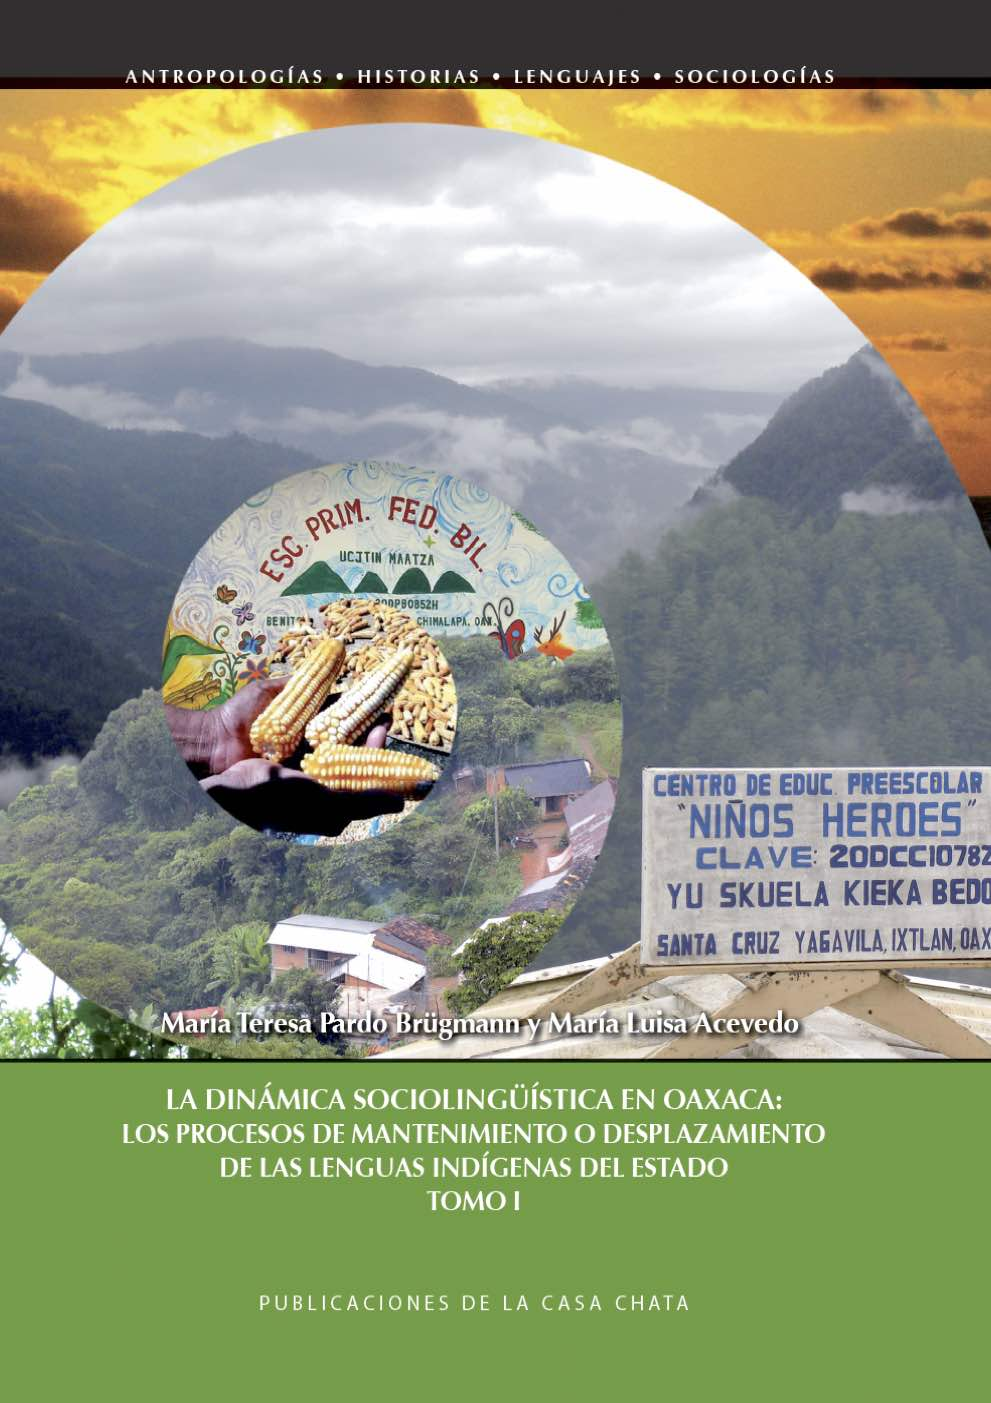 https://www.librosciesas.com/wp-content/uploads/2016/05/DinamicaIPorta.jpg